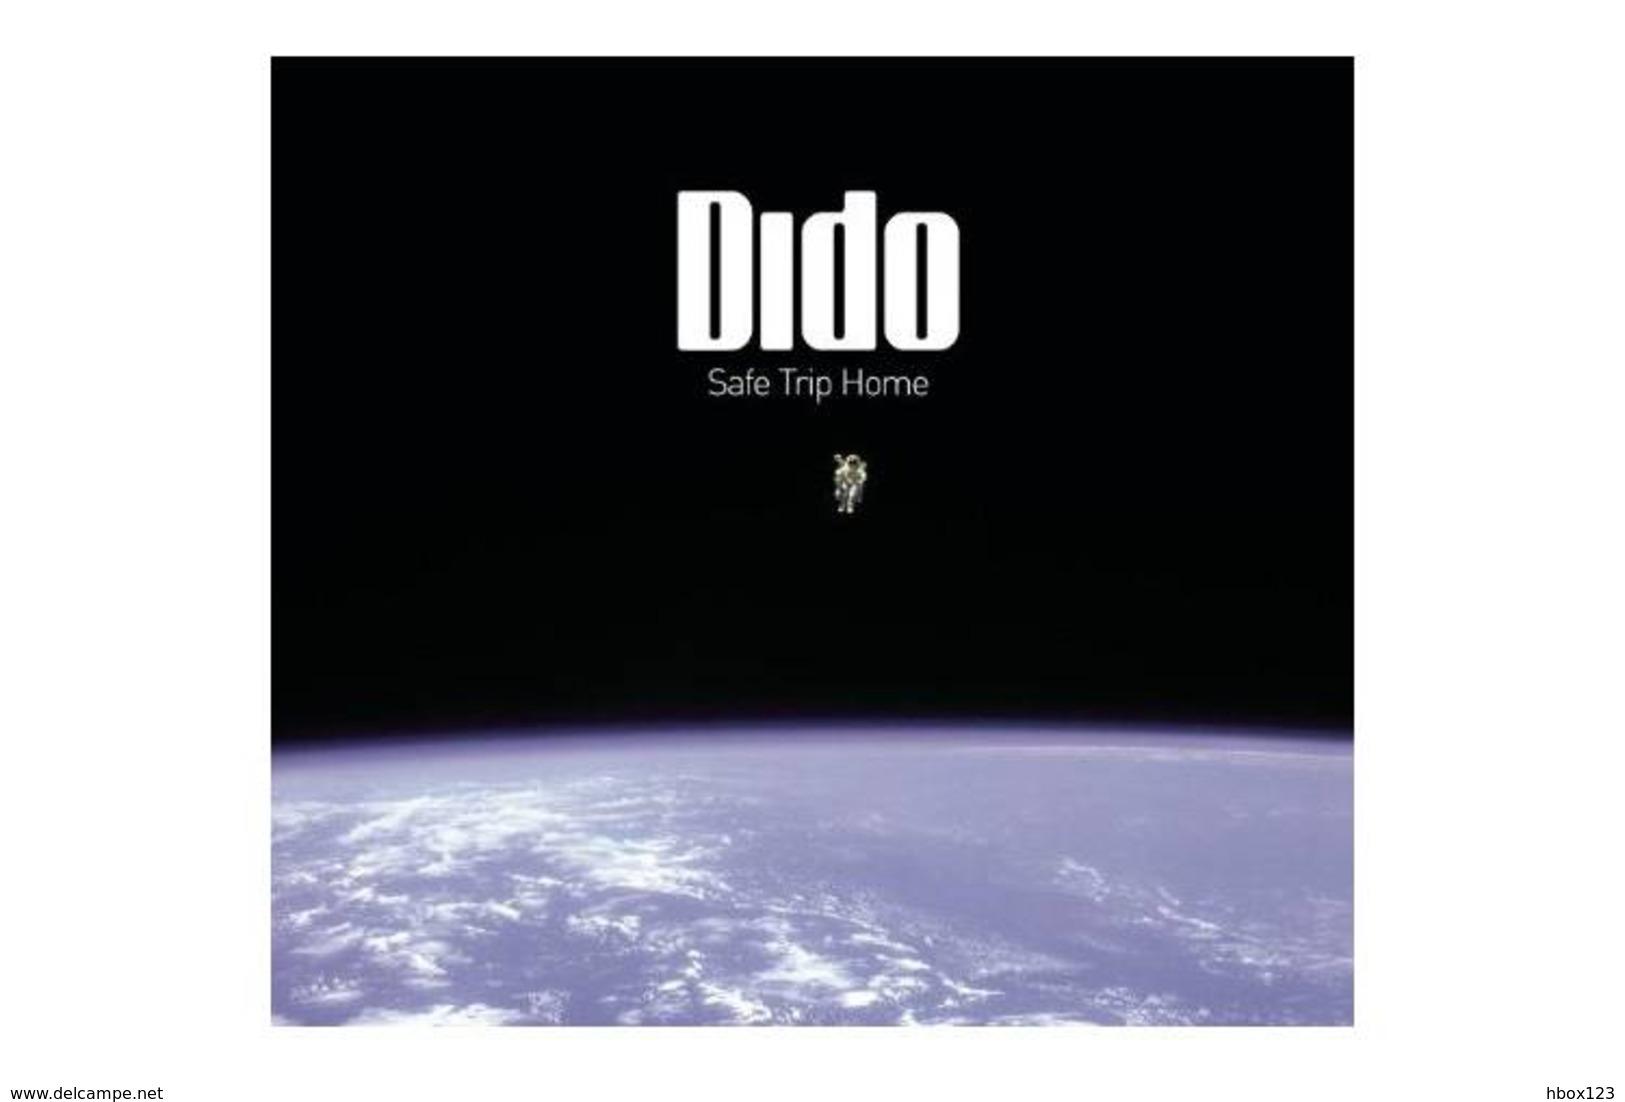 DIDO Safe Trip Home - CD 11 Tracks Jewelcase - Neuf Emballé - Disco, Pop